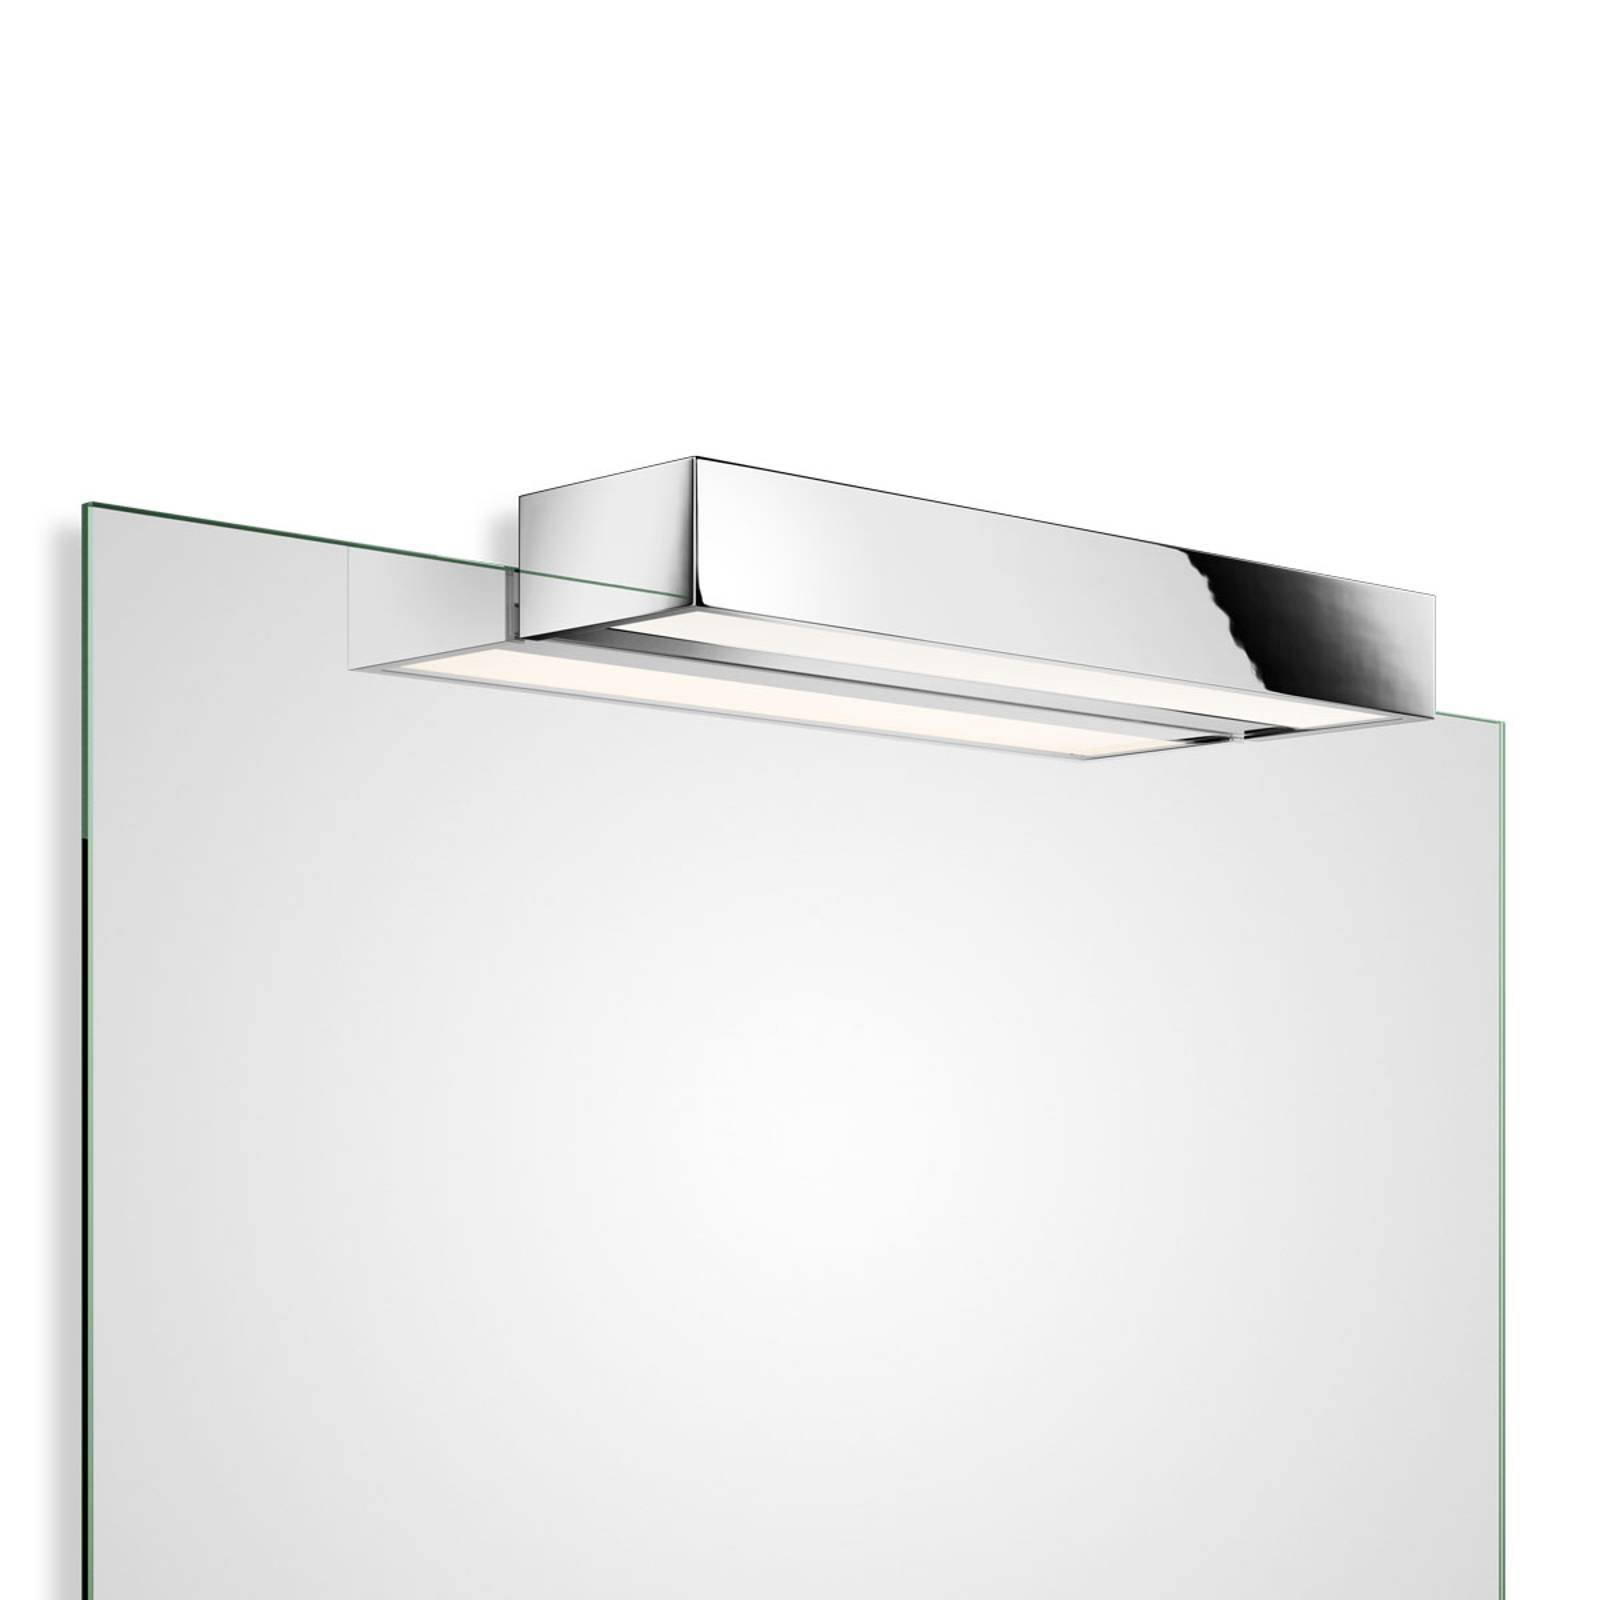 Decor Walther-boks 1-40 N LED-speillampe 3 000 K